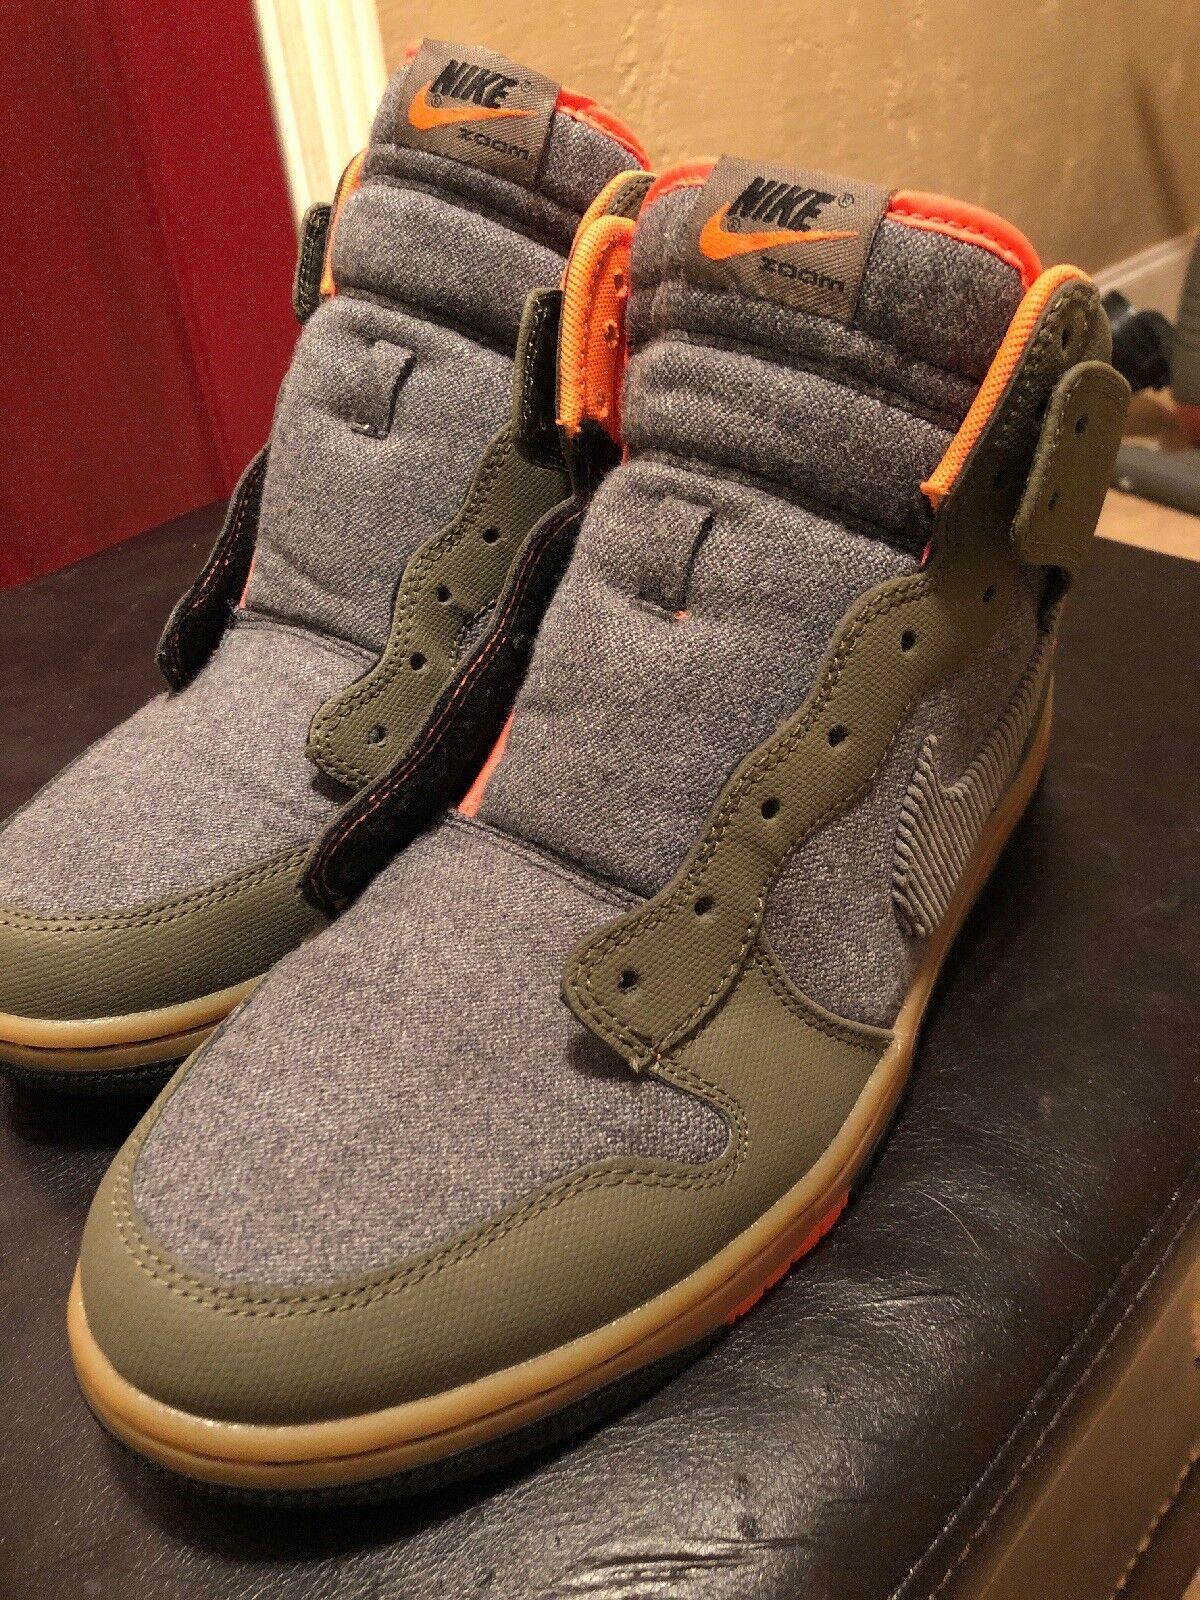 Brand New Men's NIKE SWOOSH Sporting Club shoes High Top Dunk Sz 10